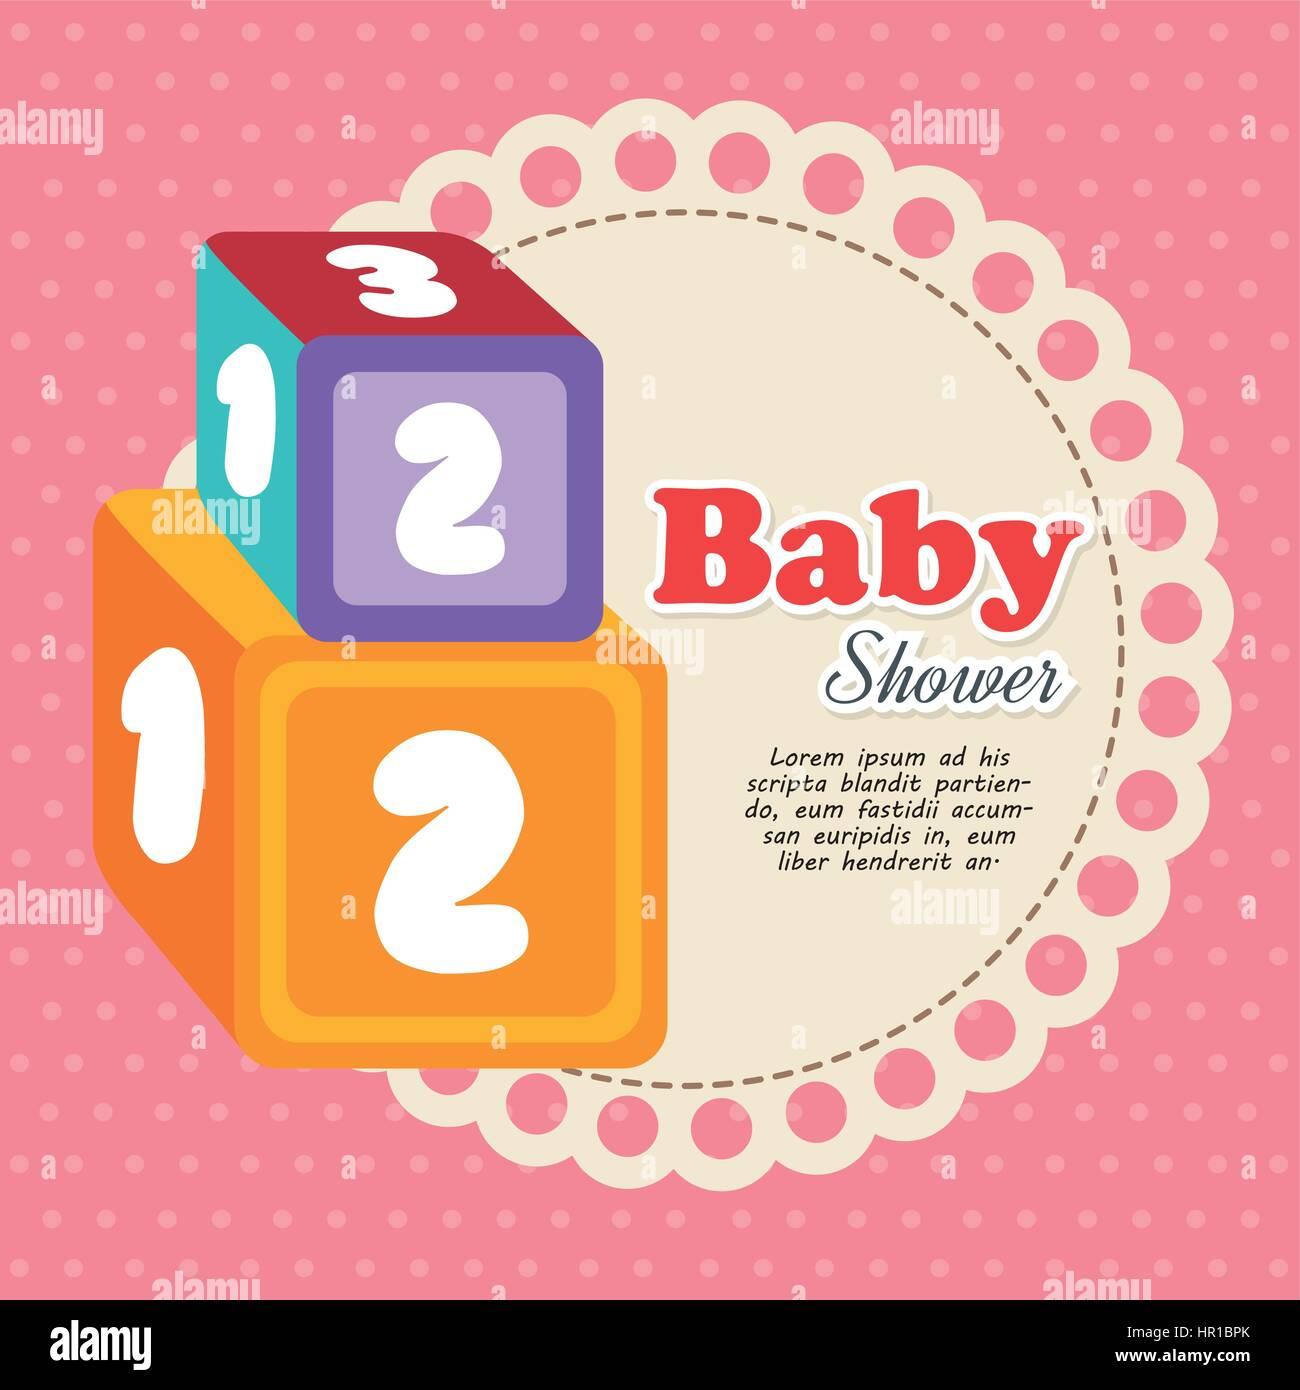 Numbers Children Stockfotos & Numbers Children Bilder - Seite 18 - Alamy